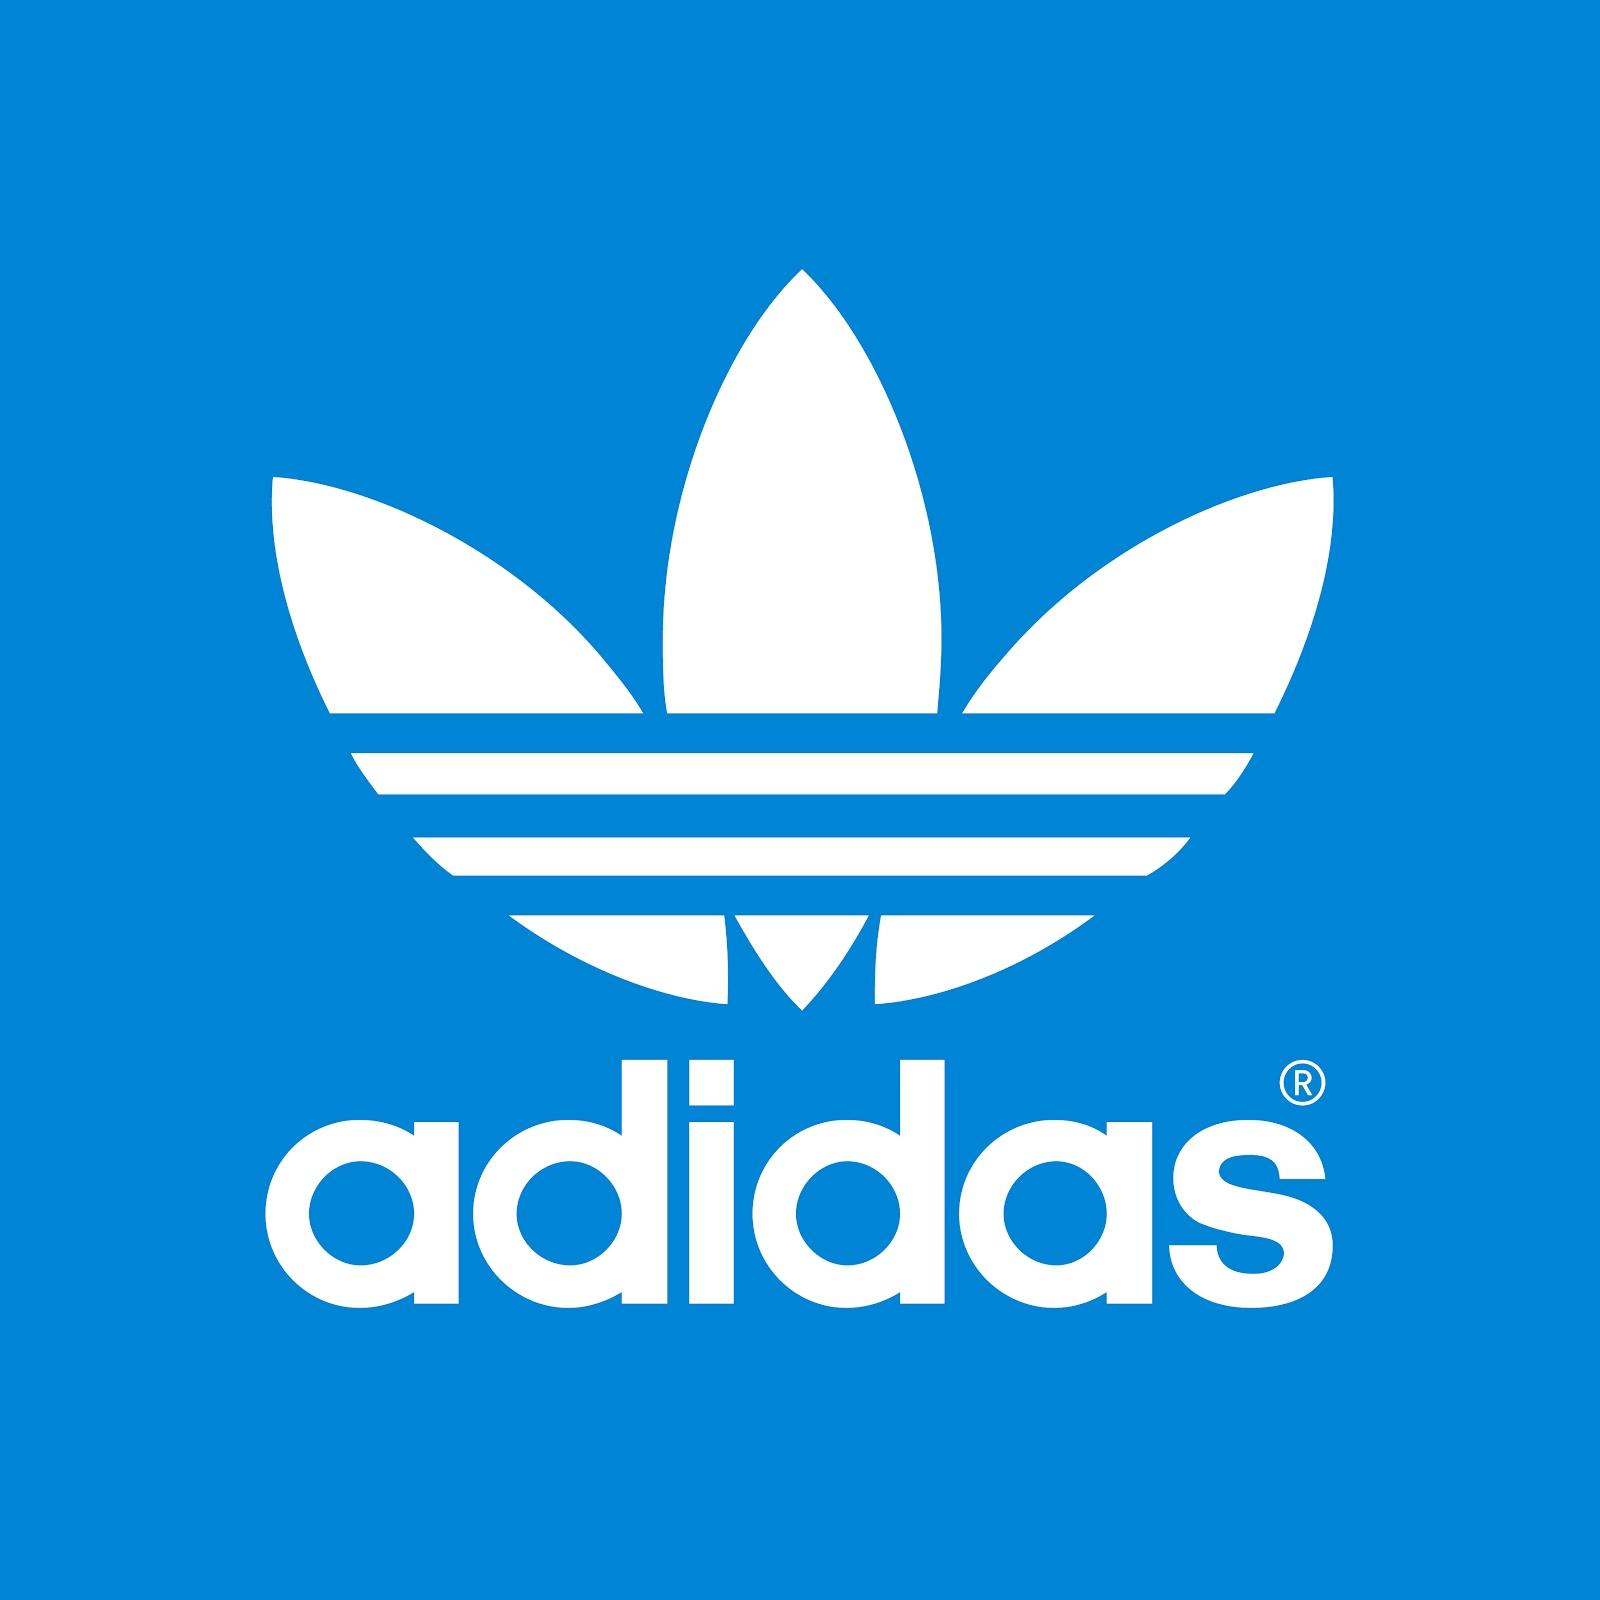 Adidas logo D Z N Pinterest Adidas logo and Logos 1600x1600